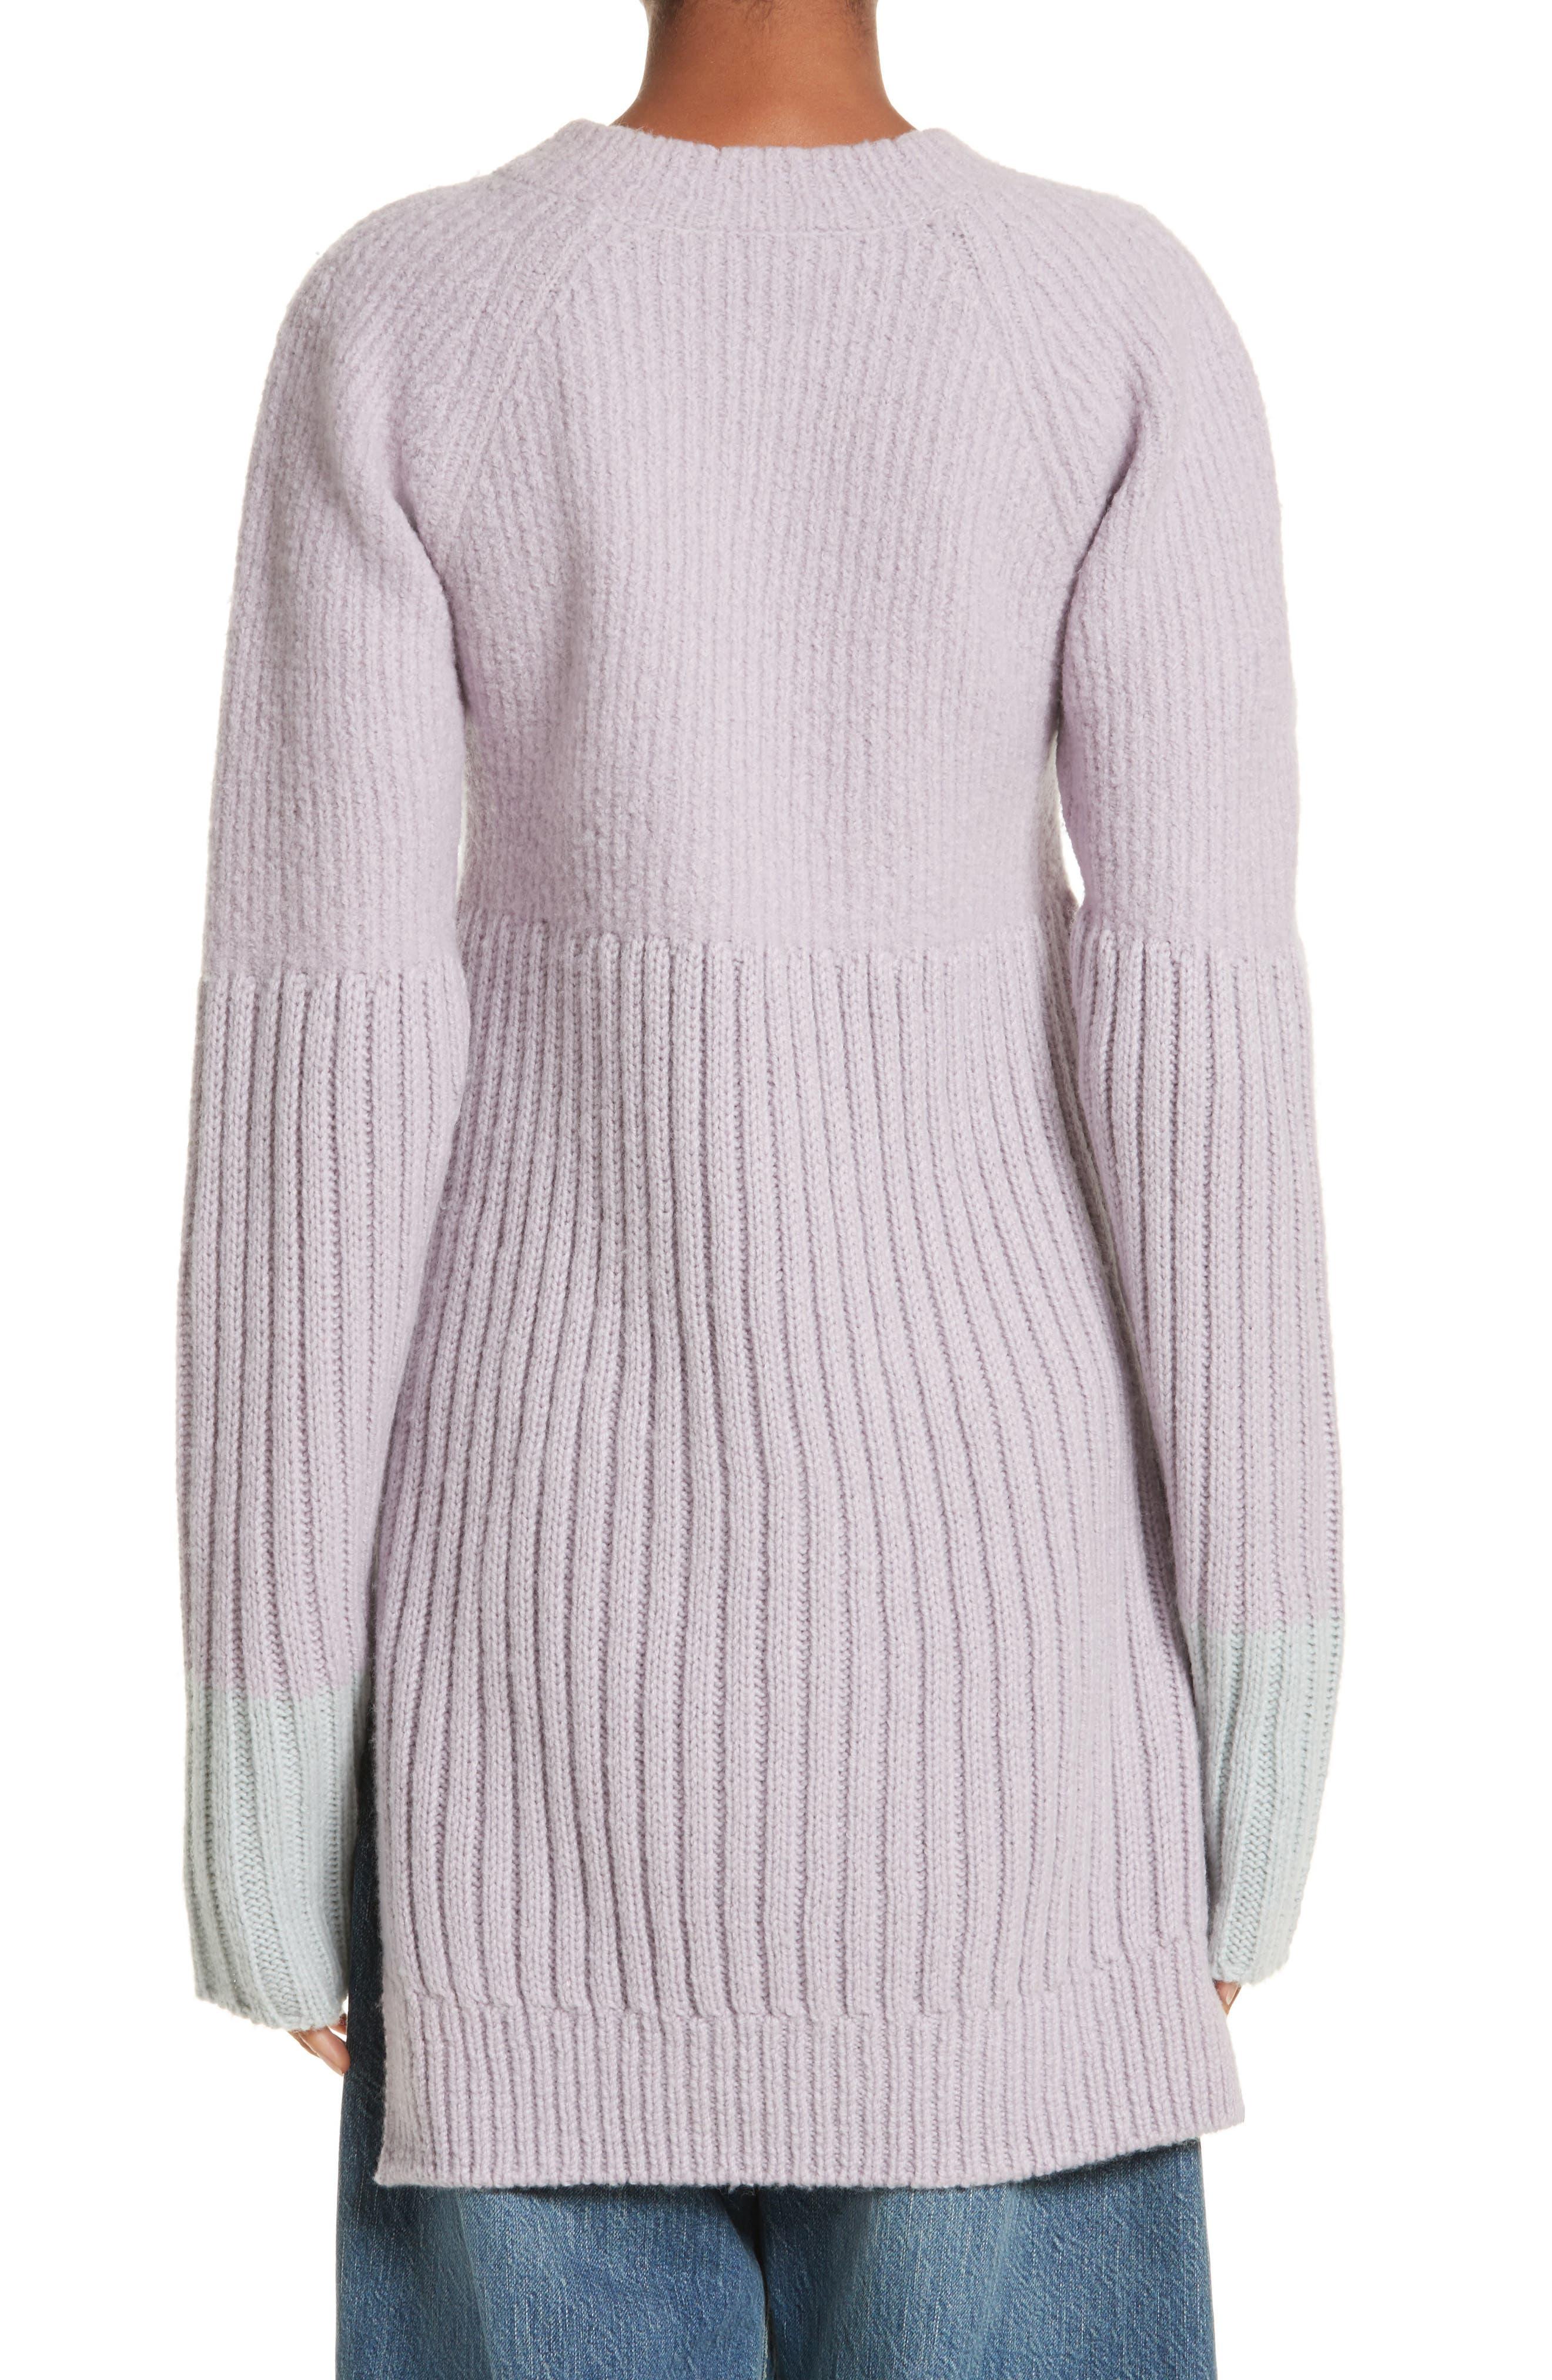 Wool Tunic Sweater,                             Alternate thumbnail 2, color,                             Lavendar